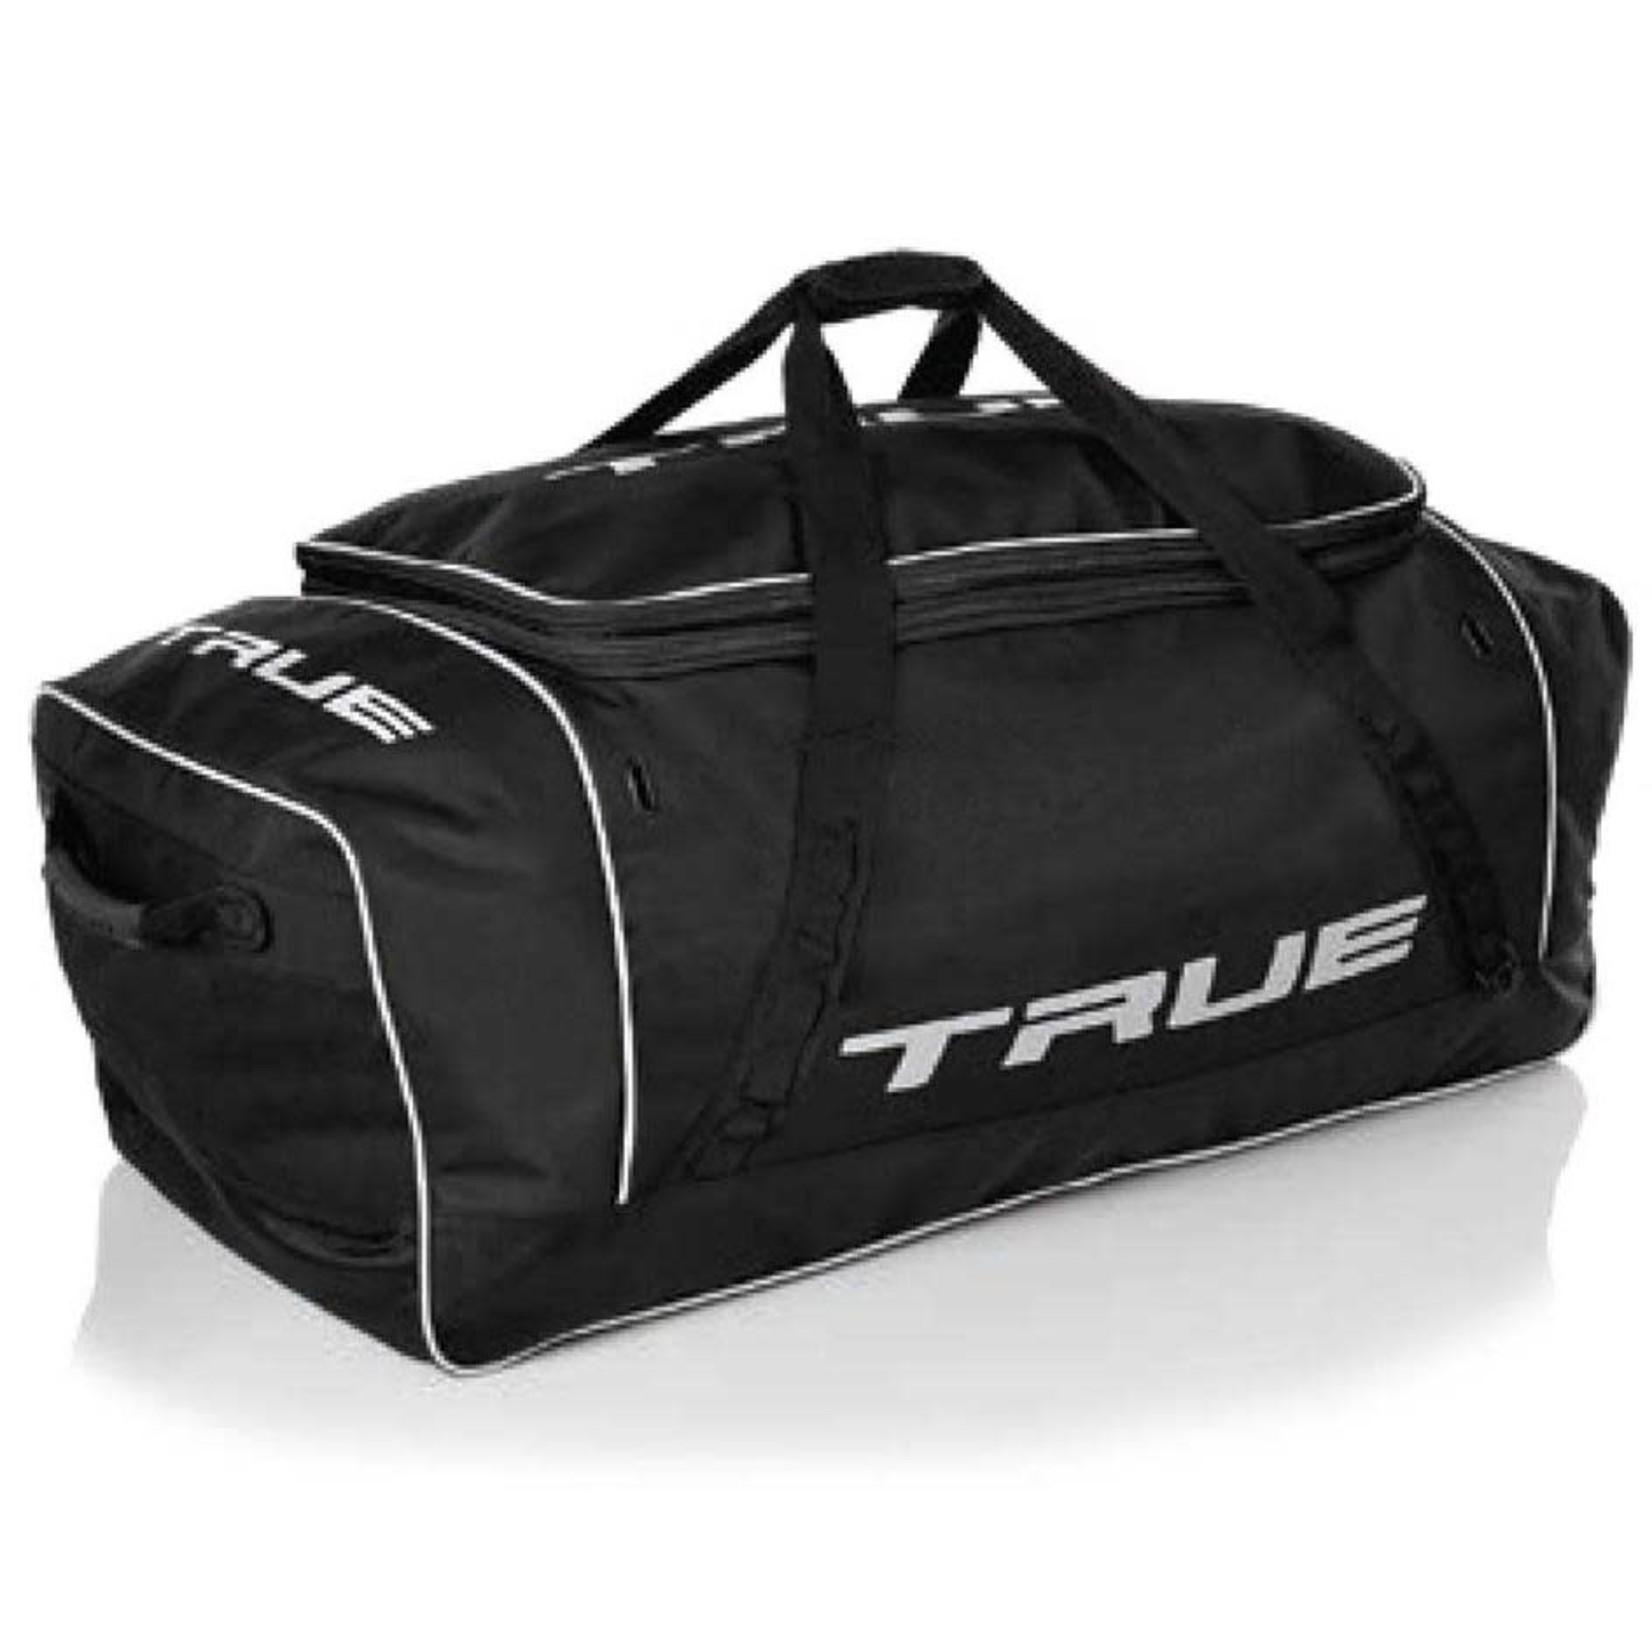 "True Hockey True Hockey Bag, Core Player Carry, 39"" X 16"" X 15"", Blk/Wht"